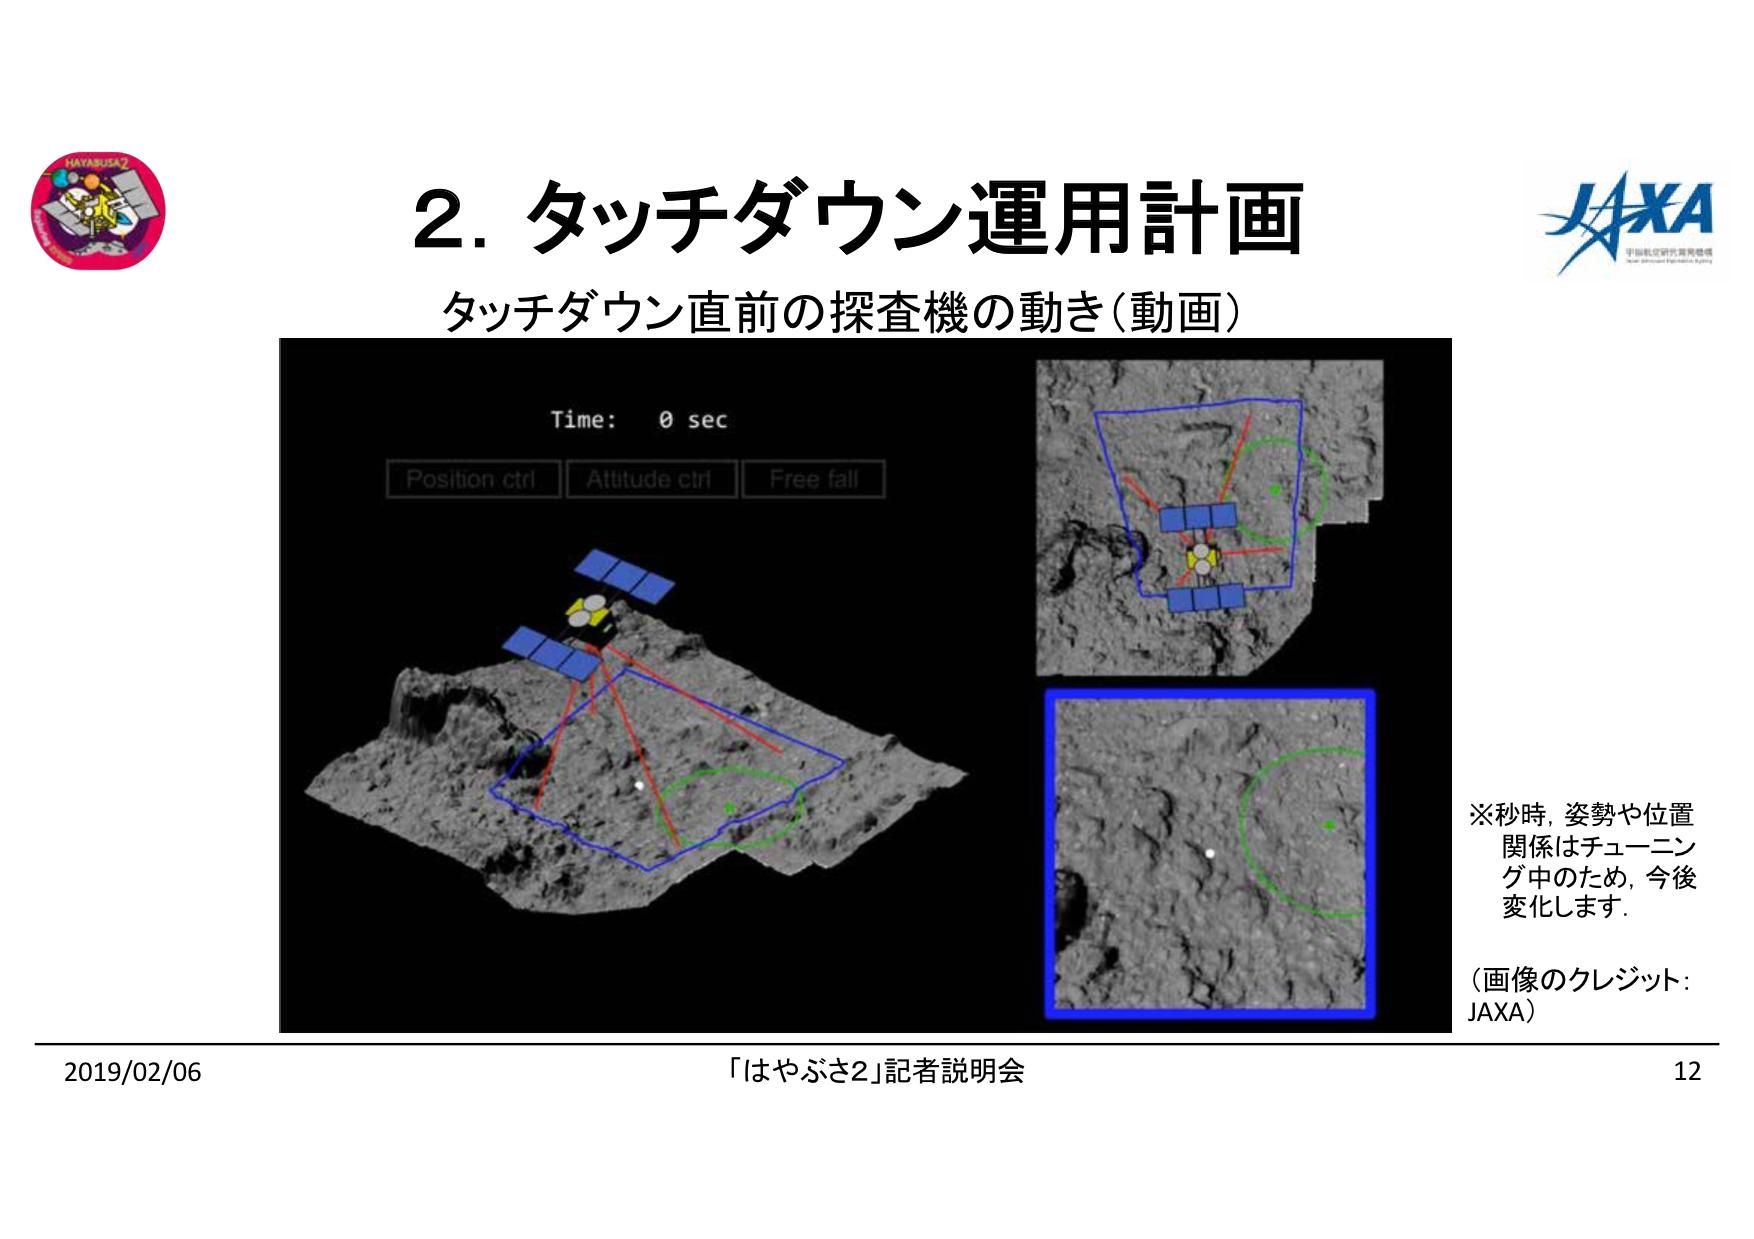 f:id:Imamura:20190204175506p:plain